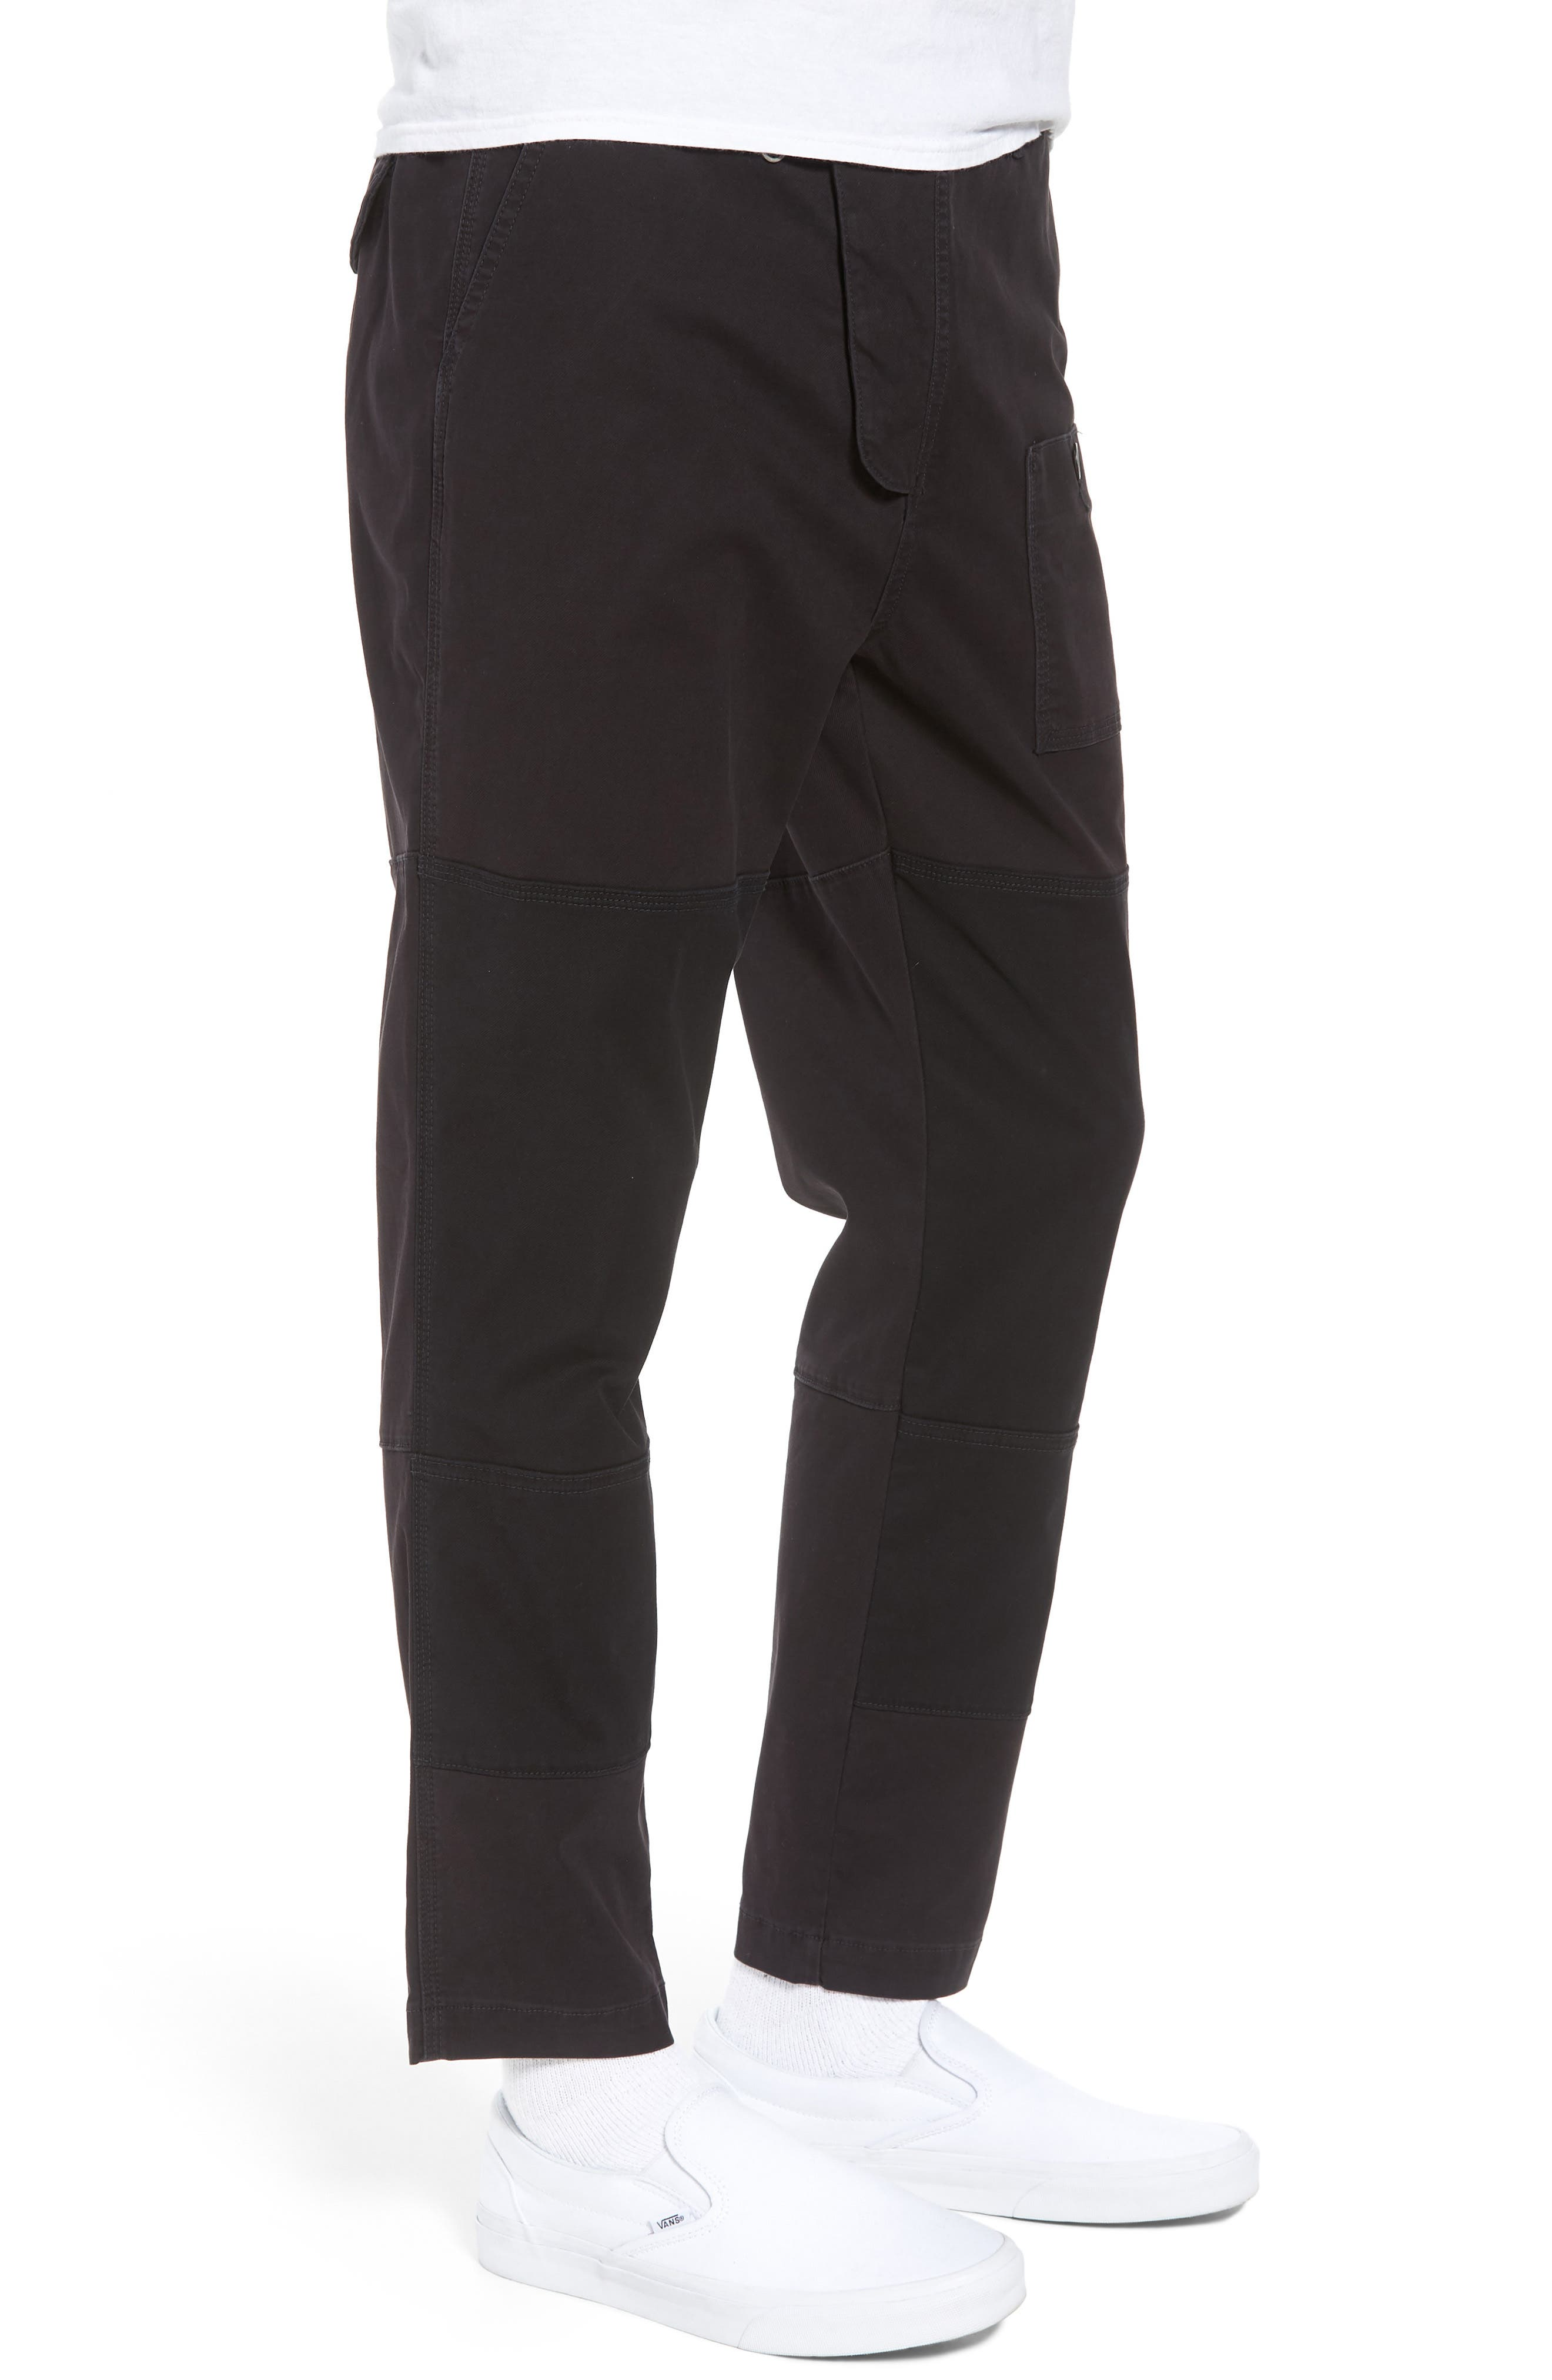 HUDSON JEANS,                             Slouchy Slim Fit Cargo Pants,                             Alternate thumbnail 3, color,                             001